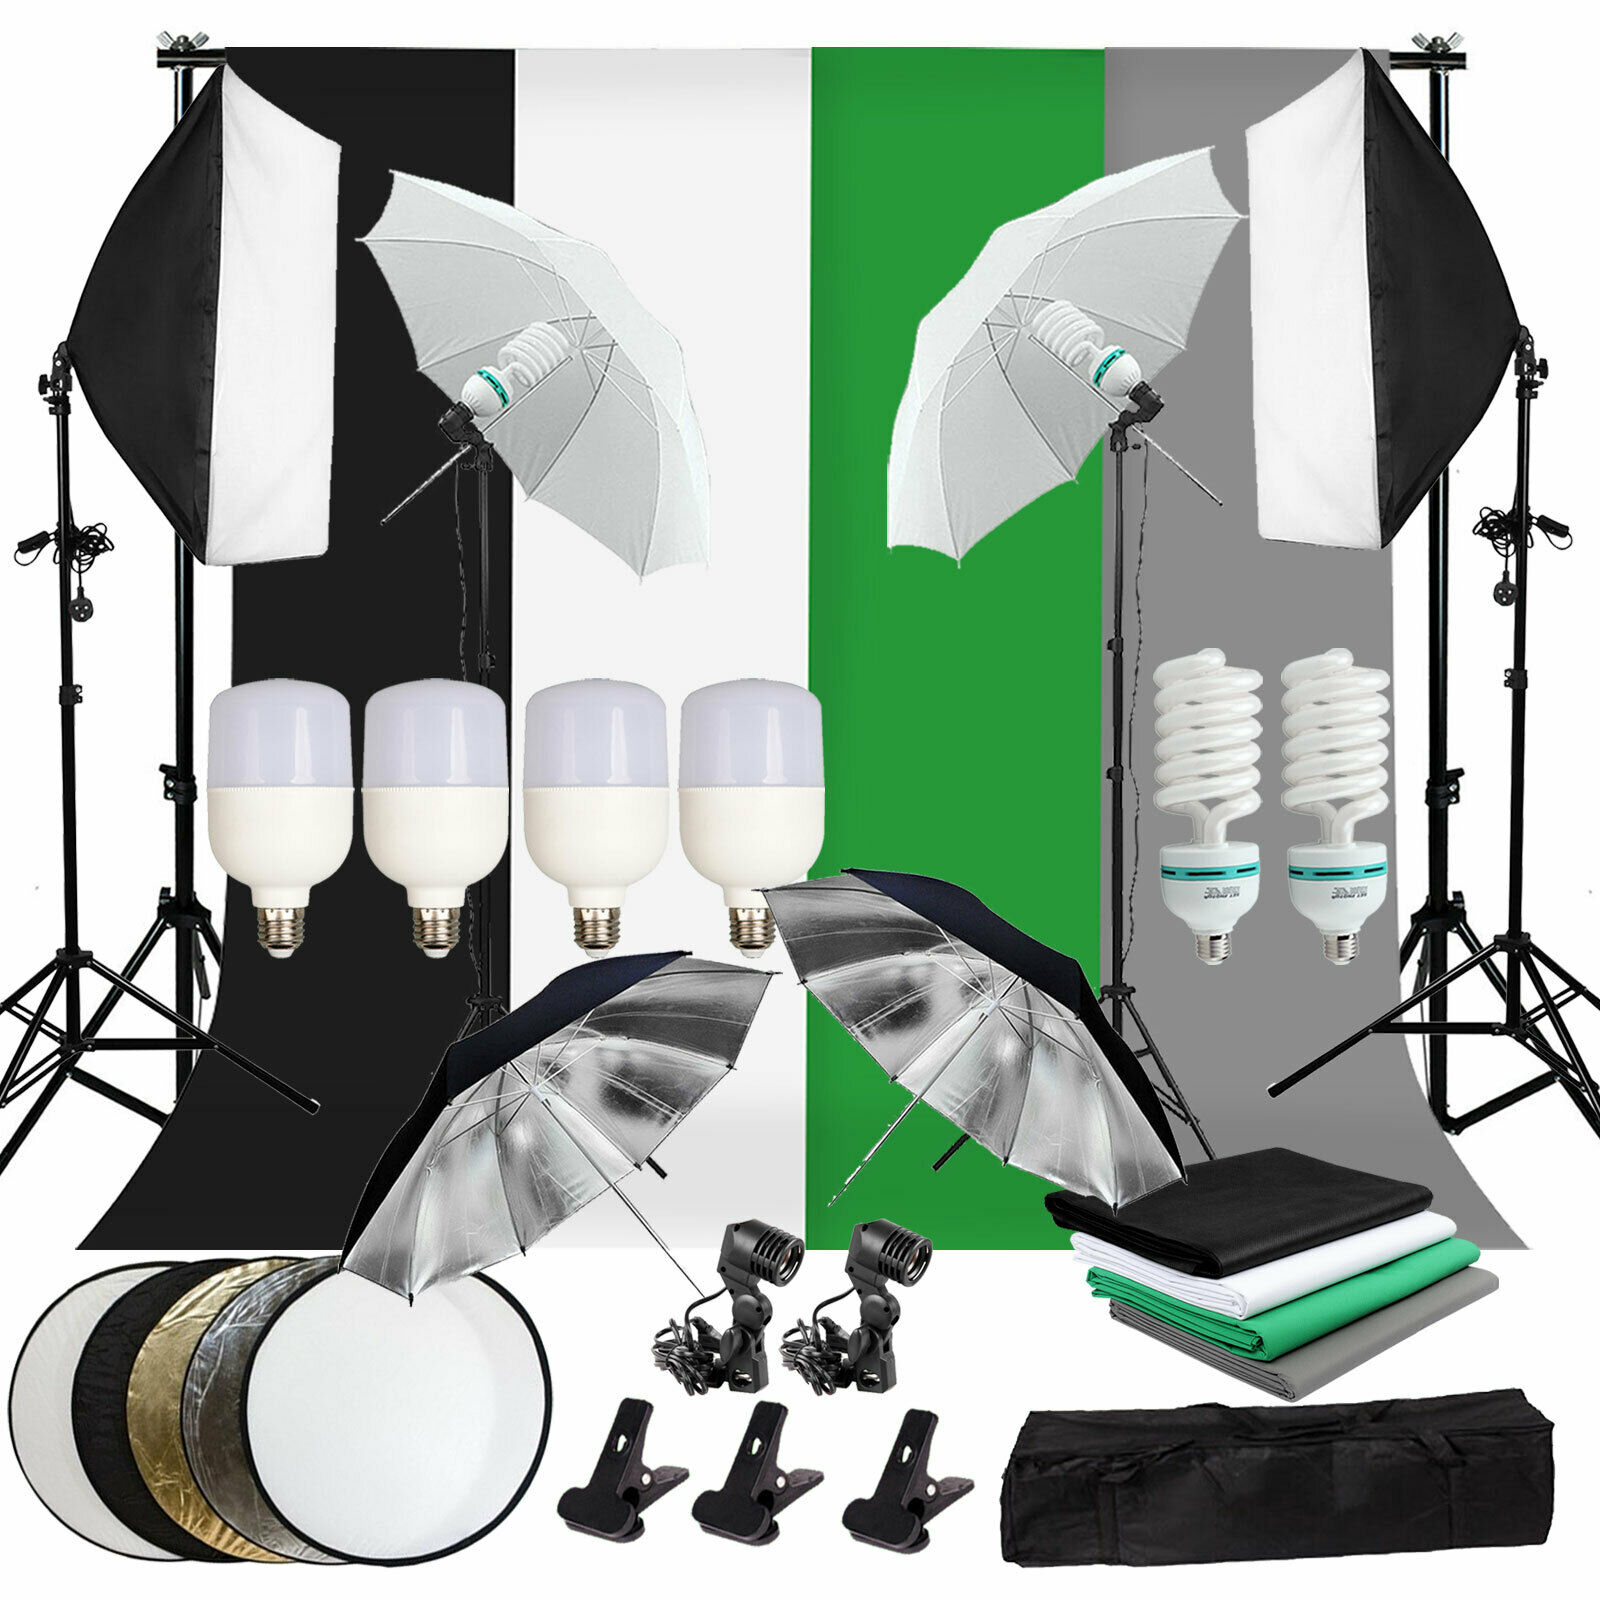 ZUOCHEN Photo Studio LED Softbox Umbrella Lighting Kit Background Support Stand Backdrop